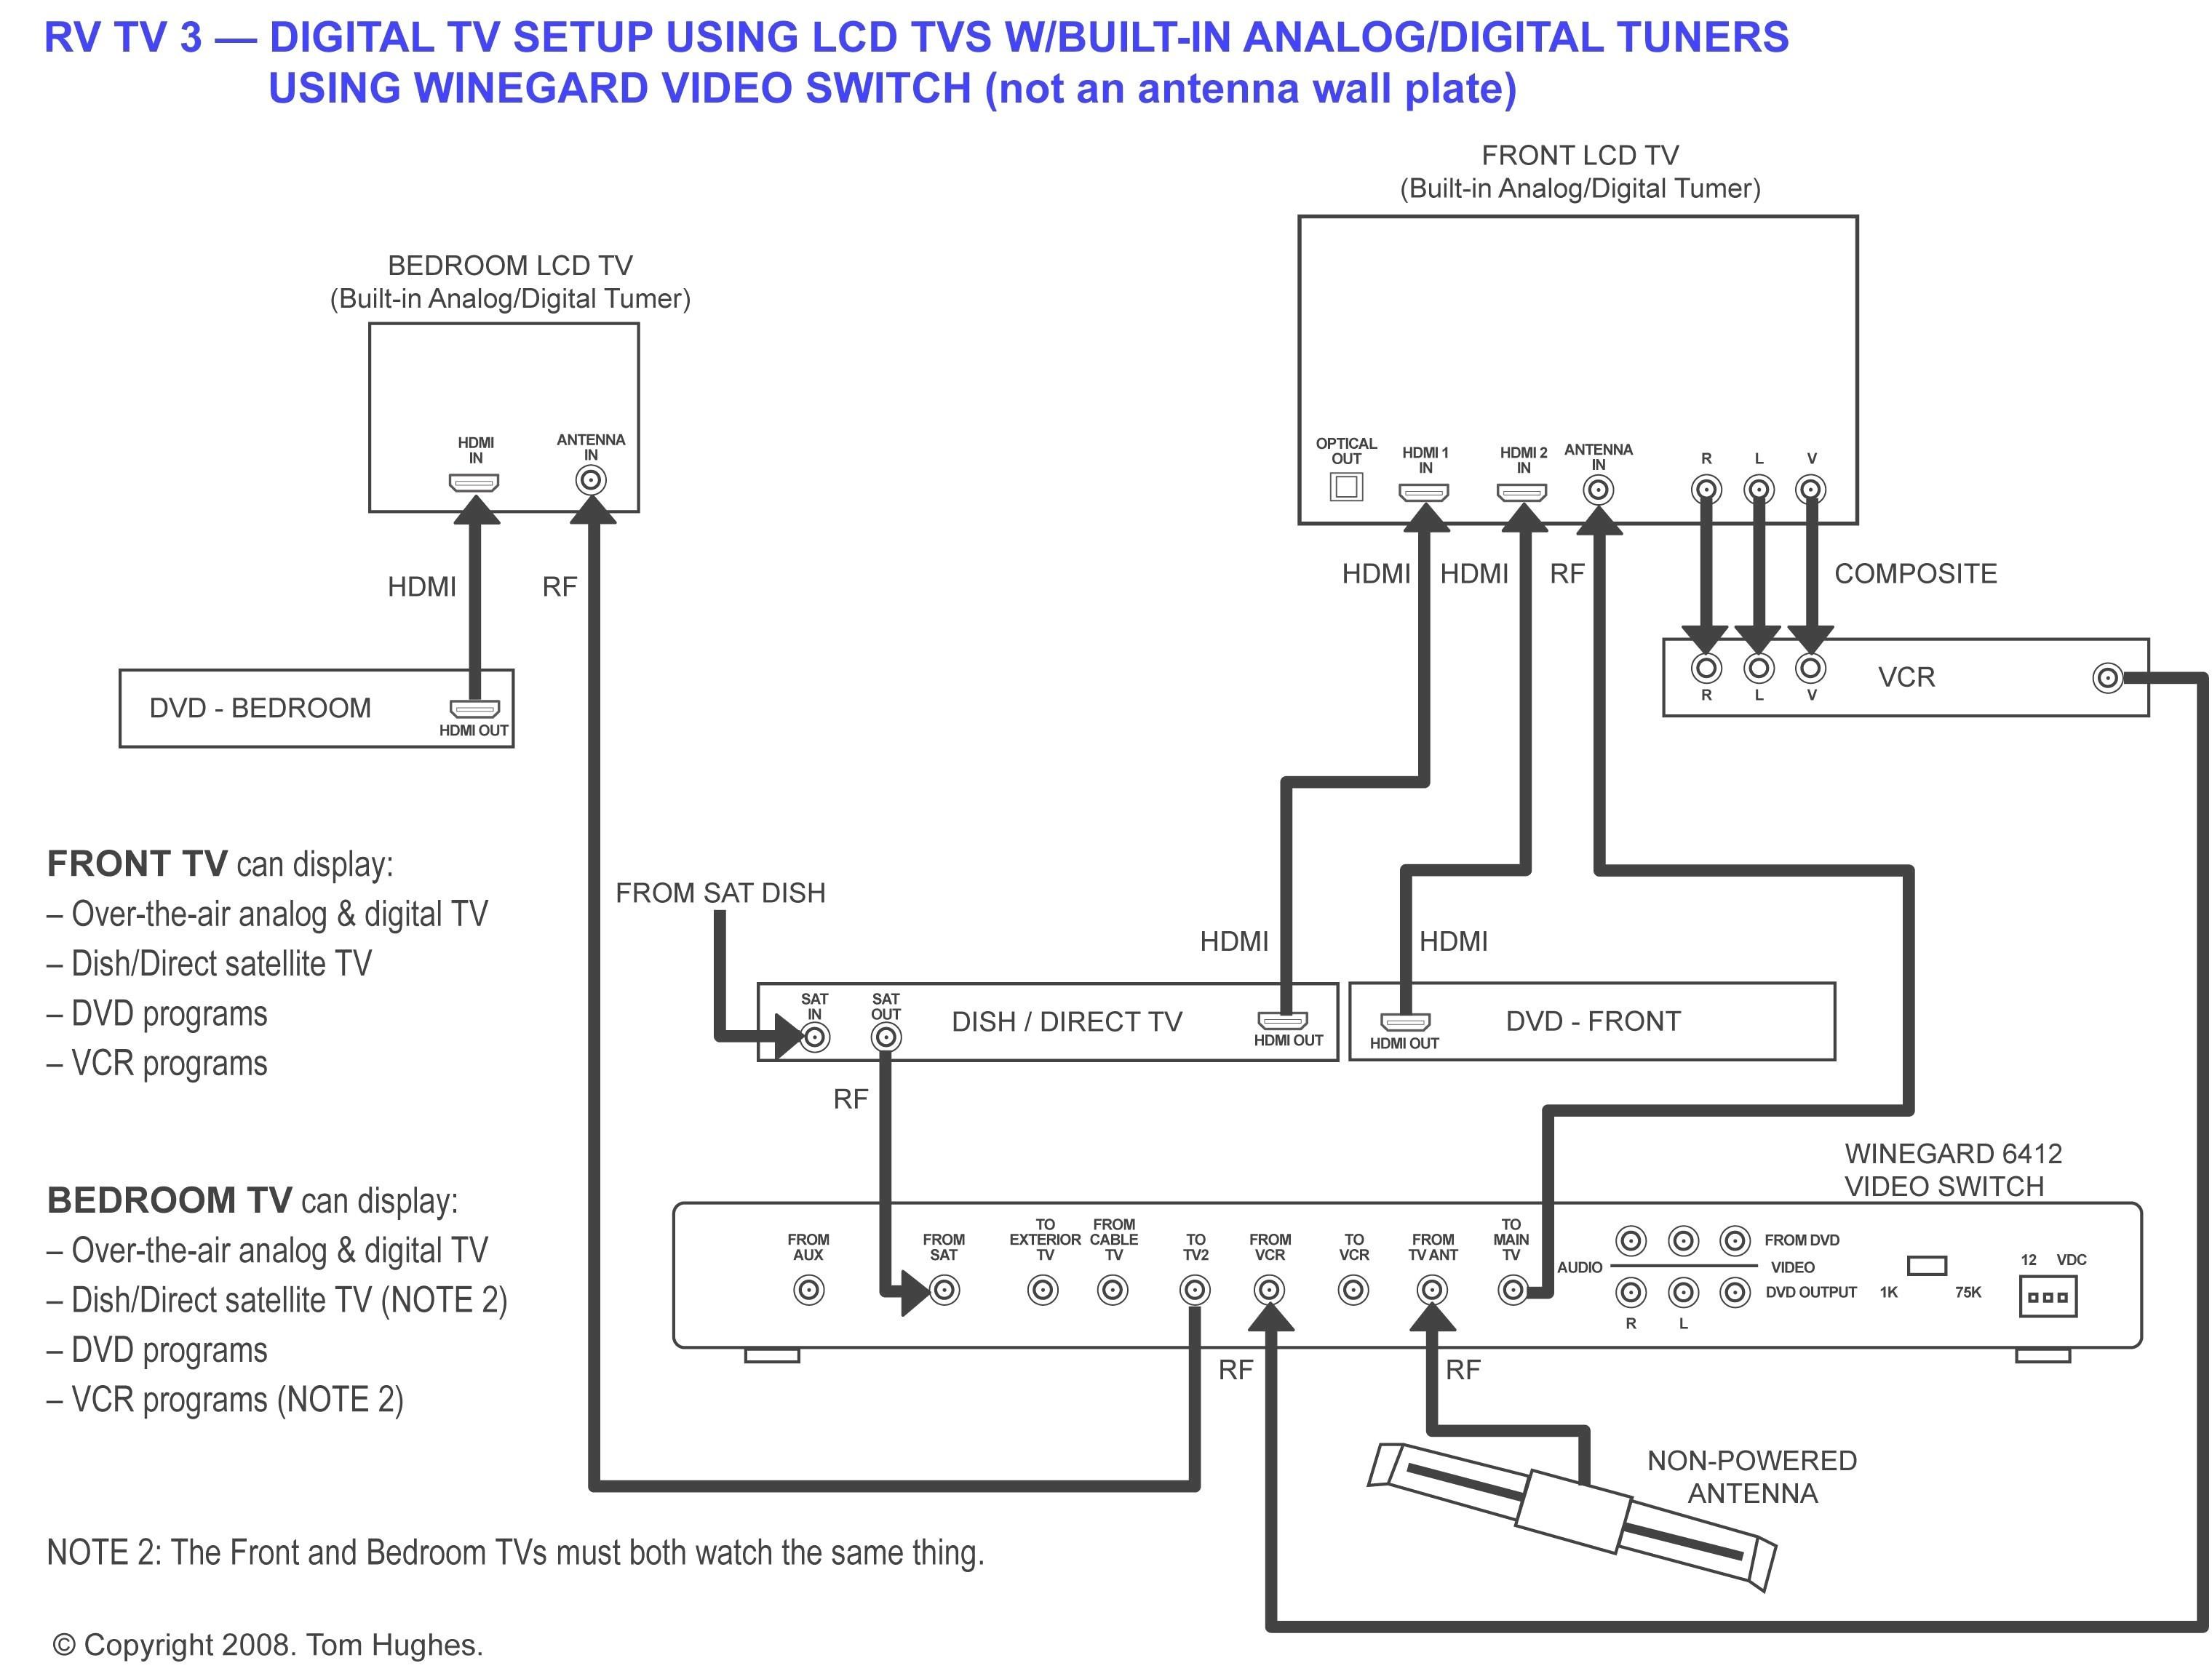 Wiring Diagram Qashqai Awesome Wiring Diagram for Trailer Valid Http Wikidiyfaqorguk 0 0d